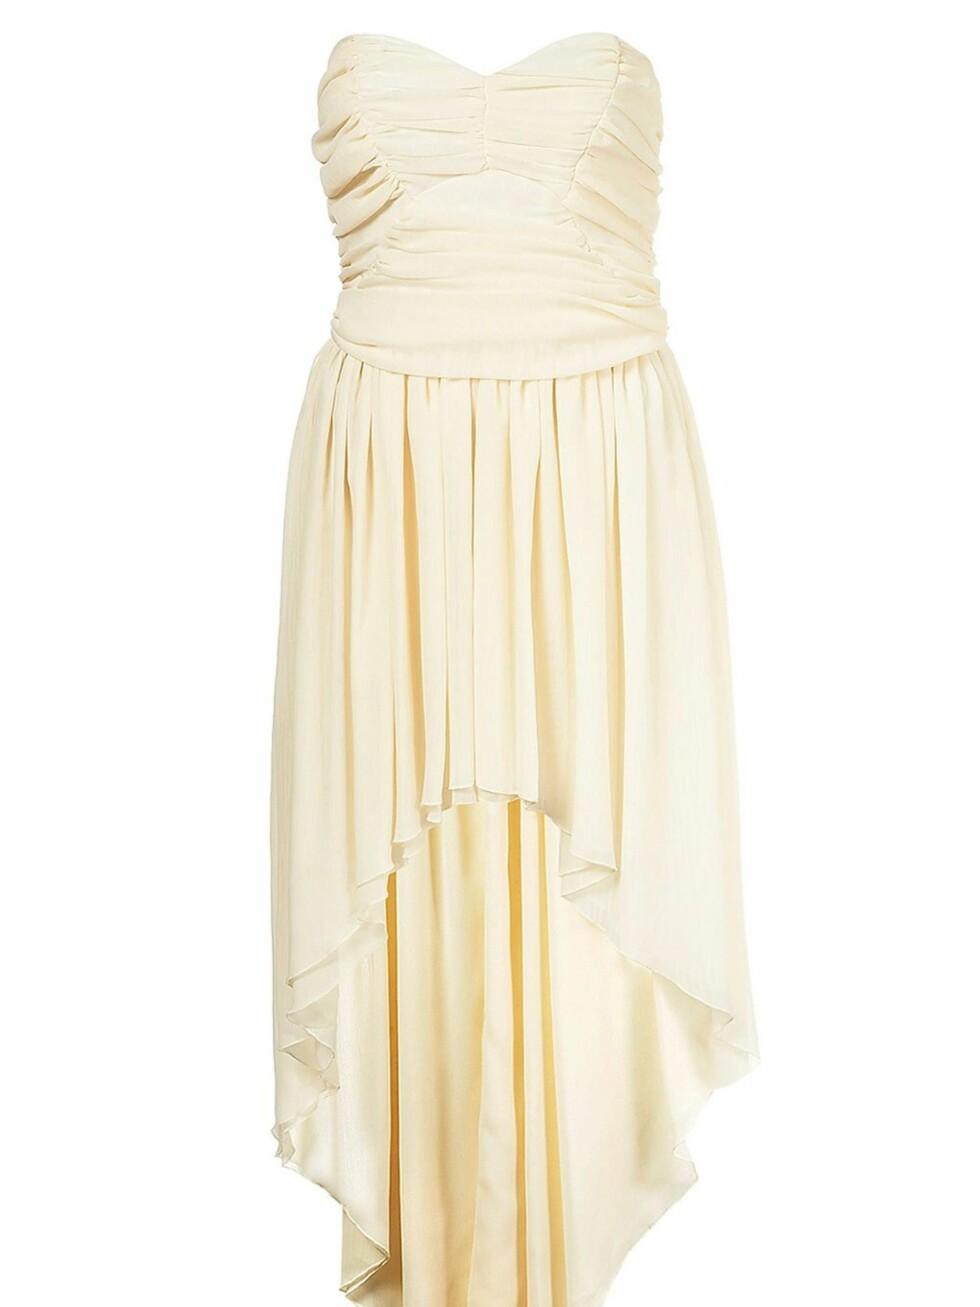 Stroppeløs kjole (ca kr 600, Topshop).